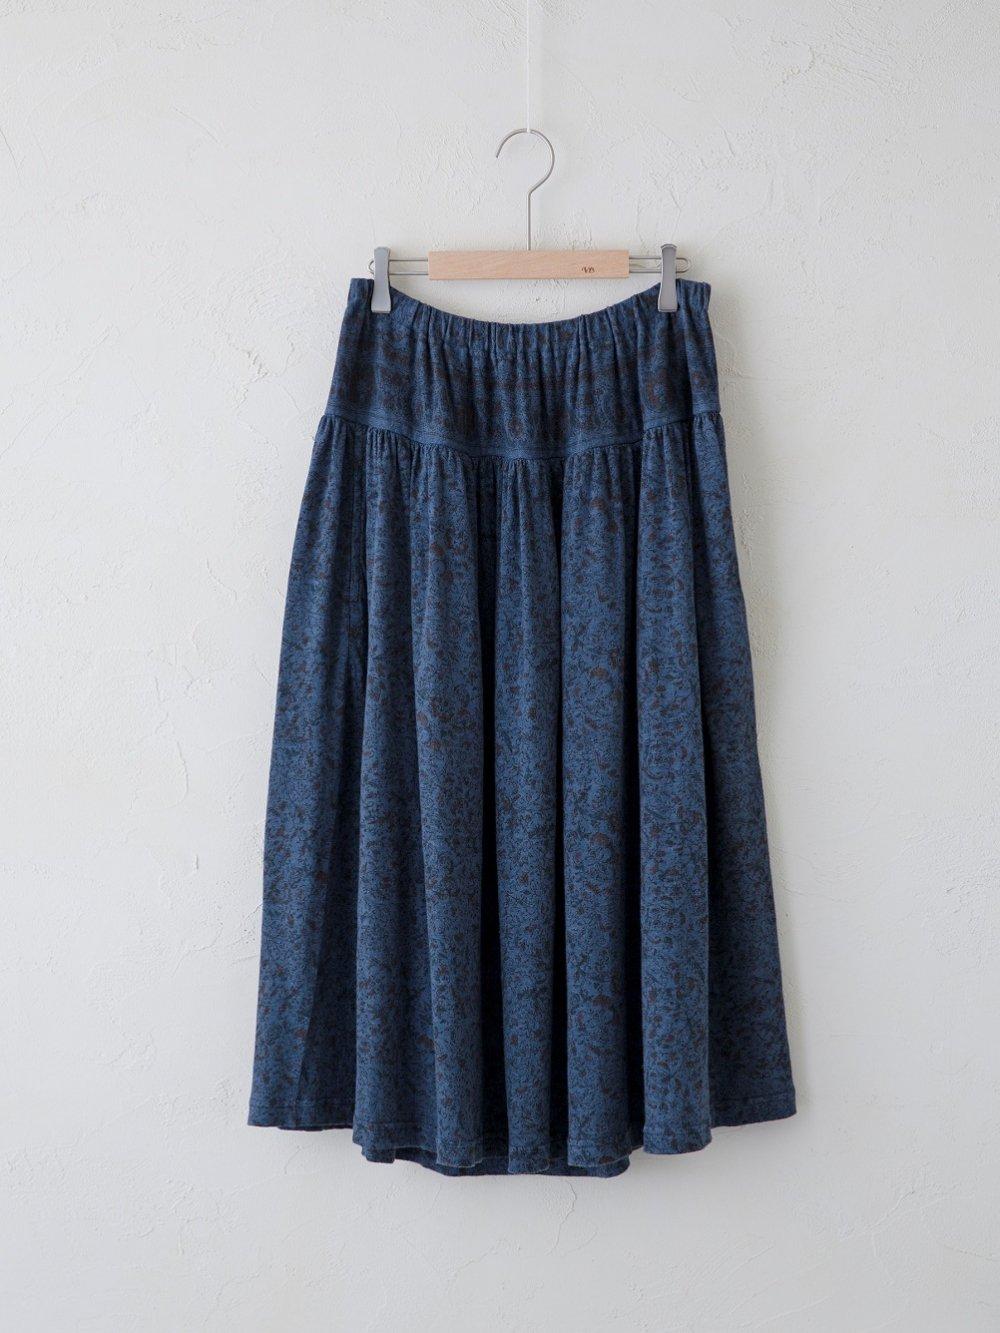 KL Plain Print ギャザースカート